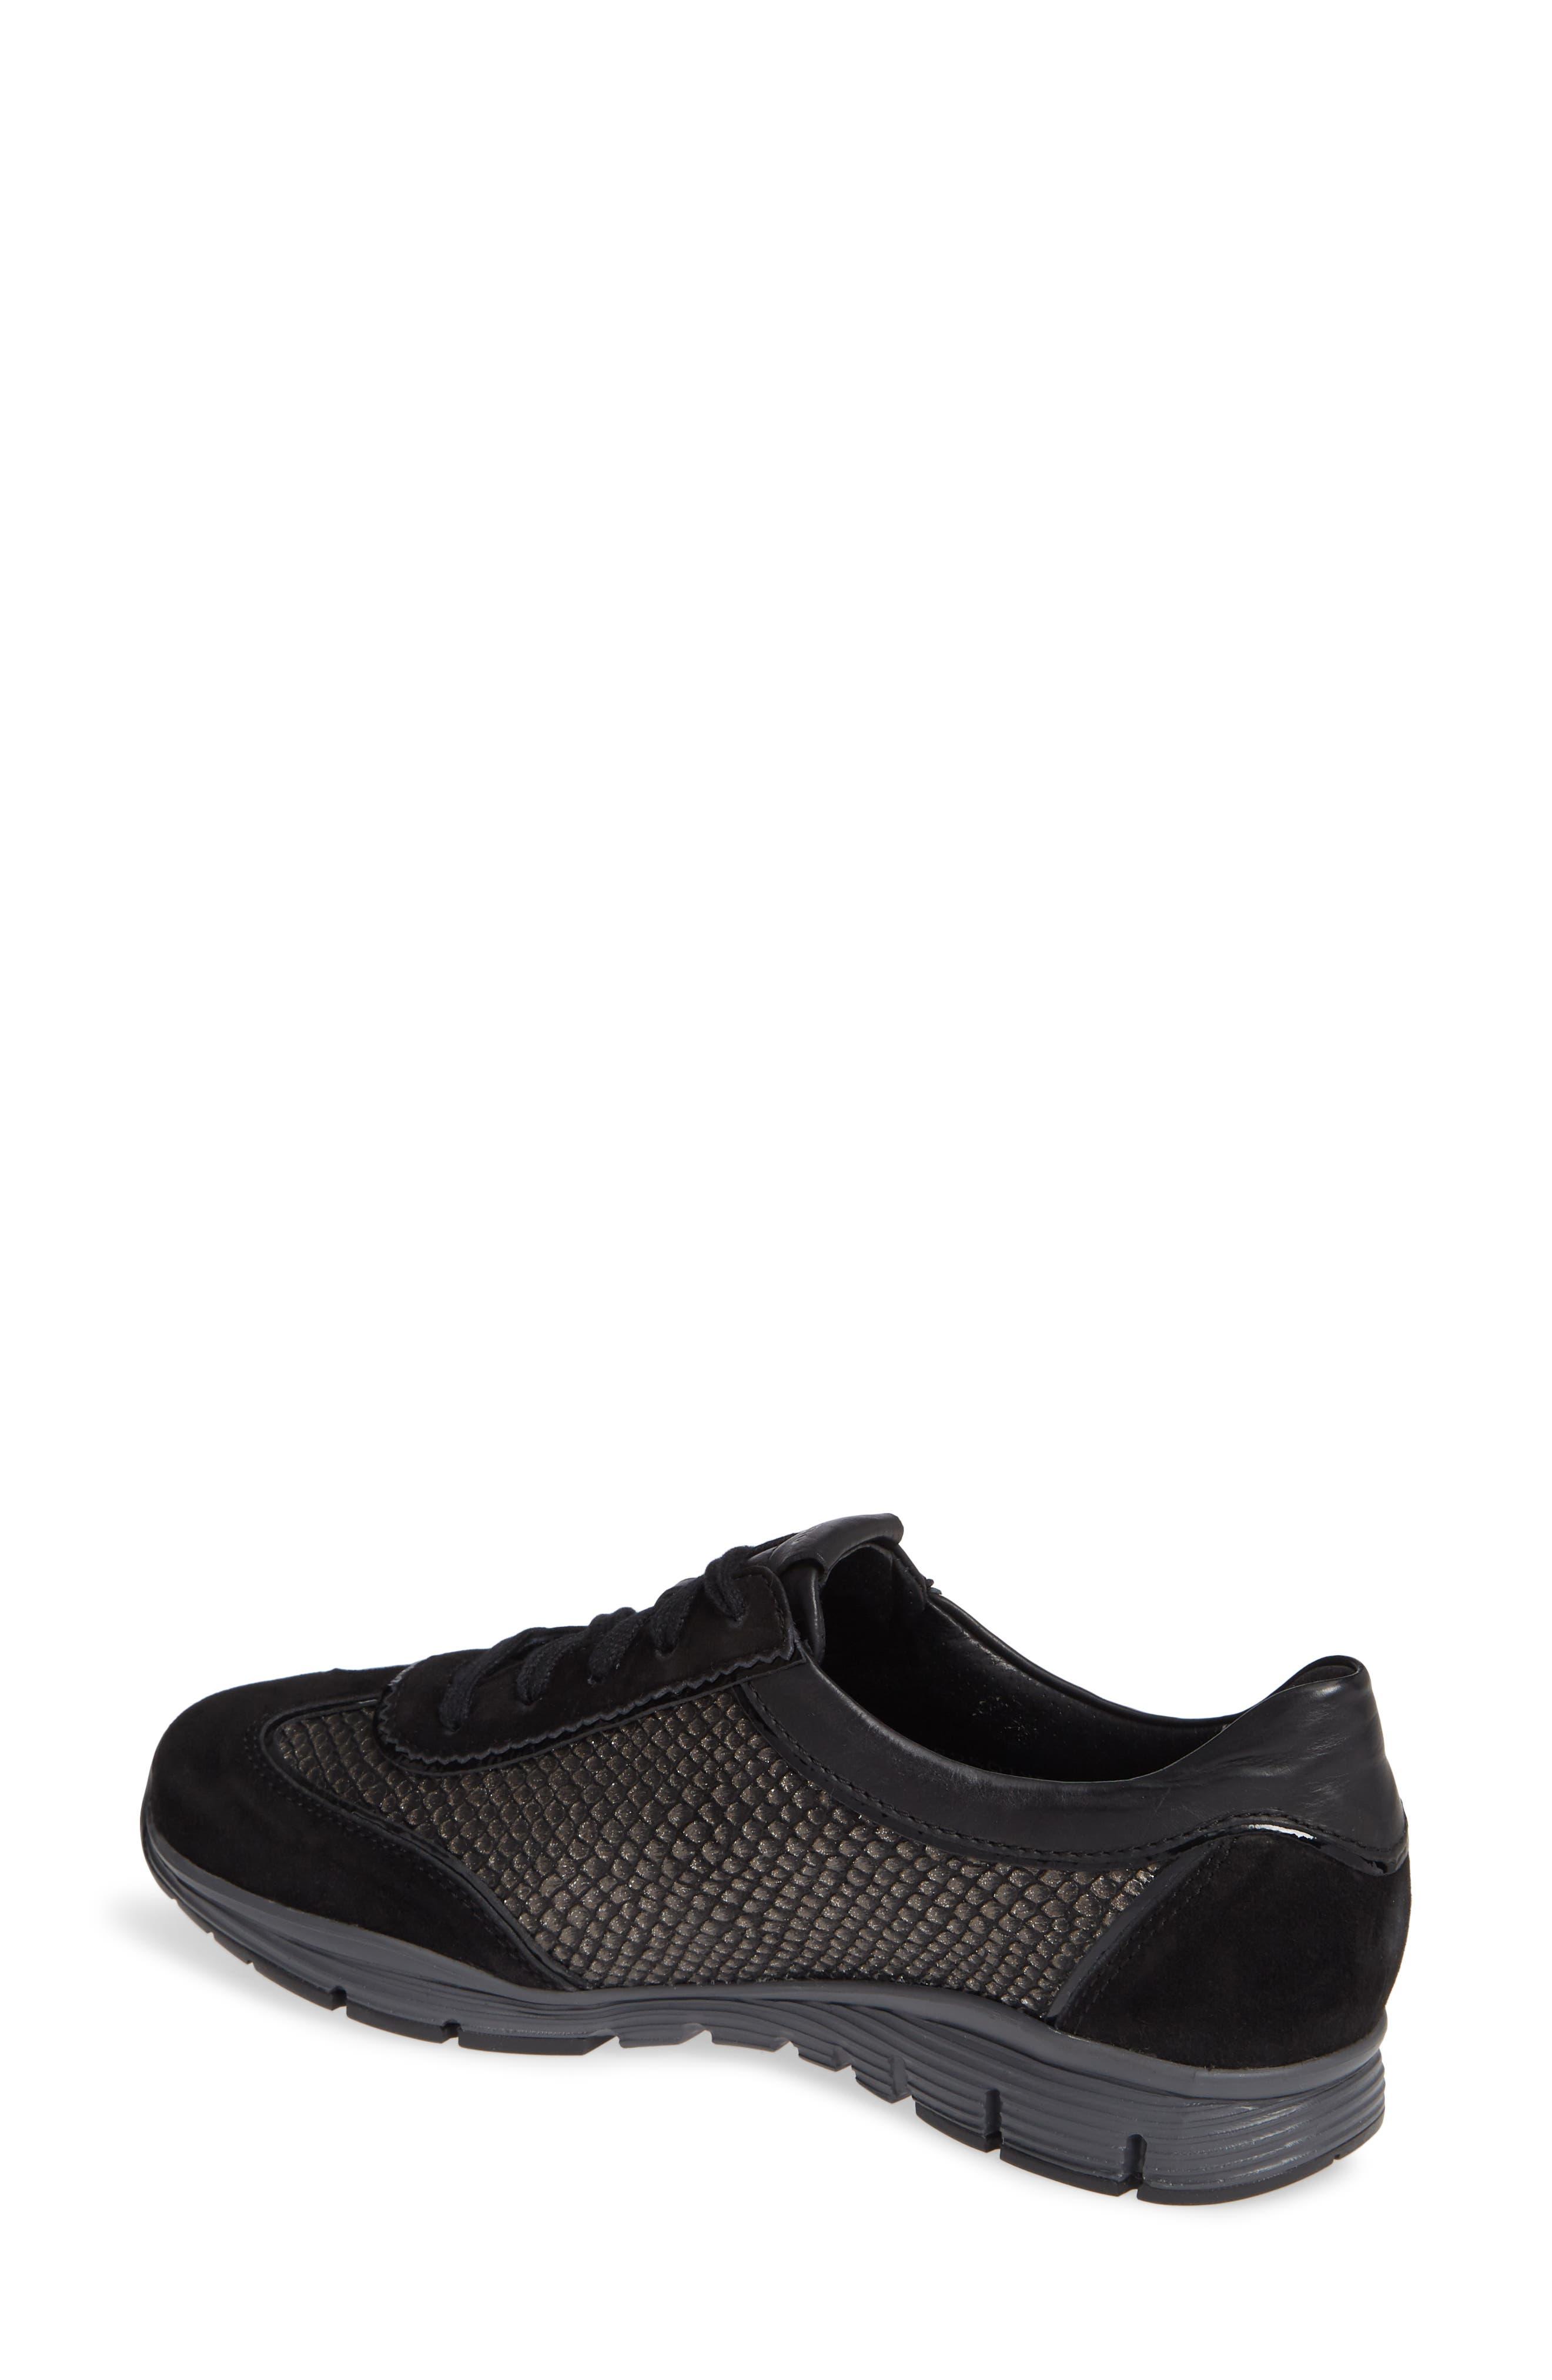 MEPHISTO, 'Yael' Soft-Air Sneaker, Alternate thumbnail 2, color, BLACK SUEDE